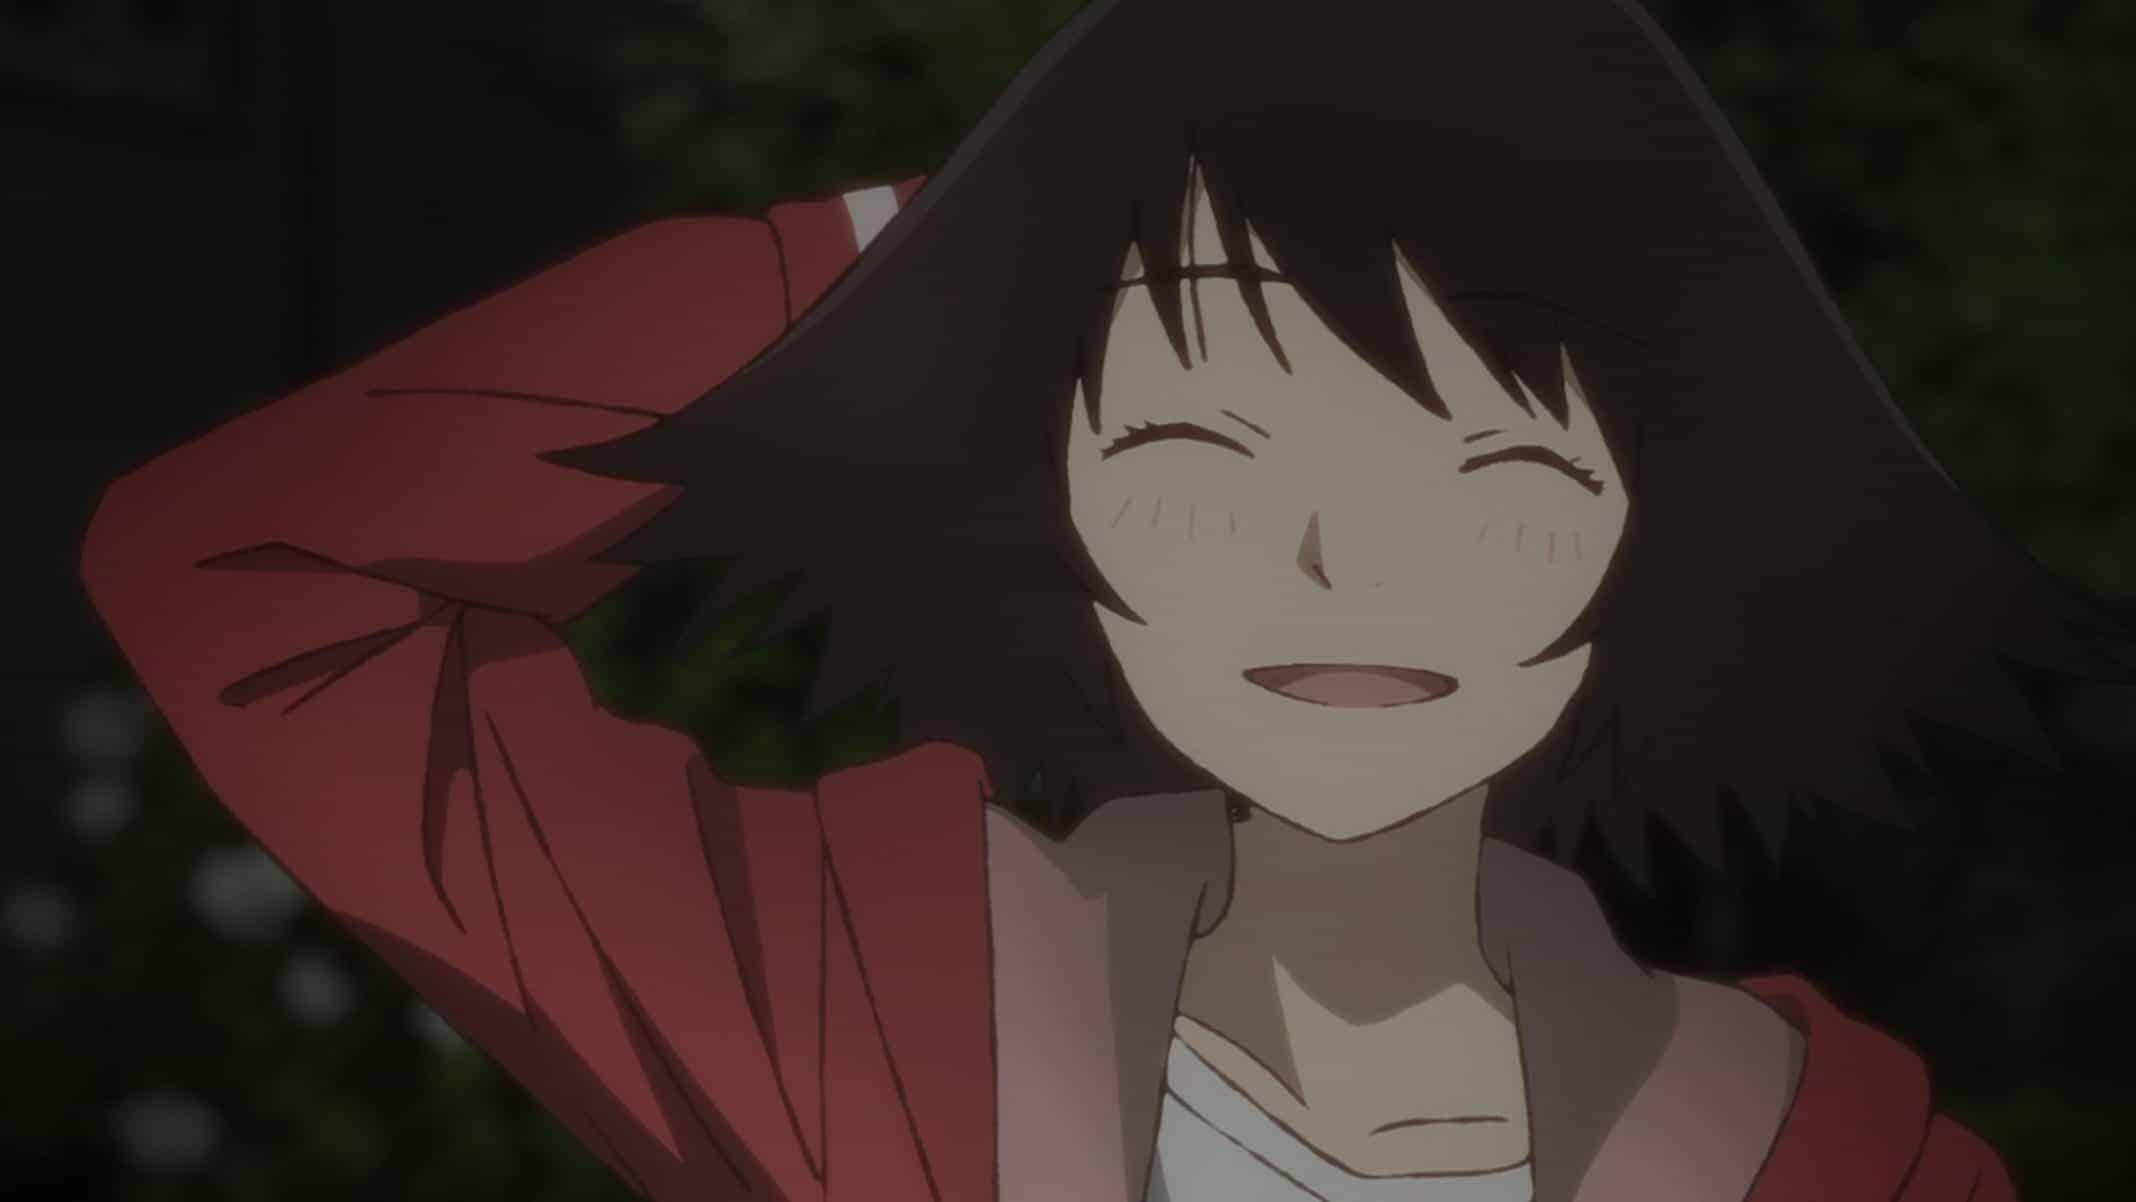 Haru trying to shrug off something Rikuo said.